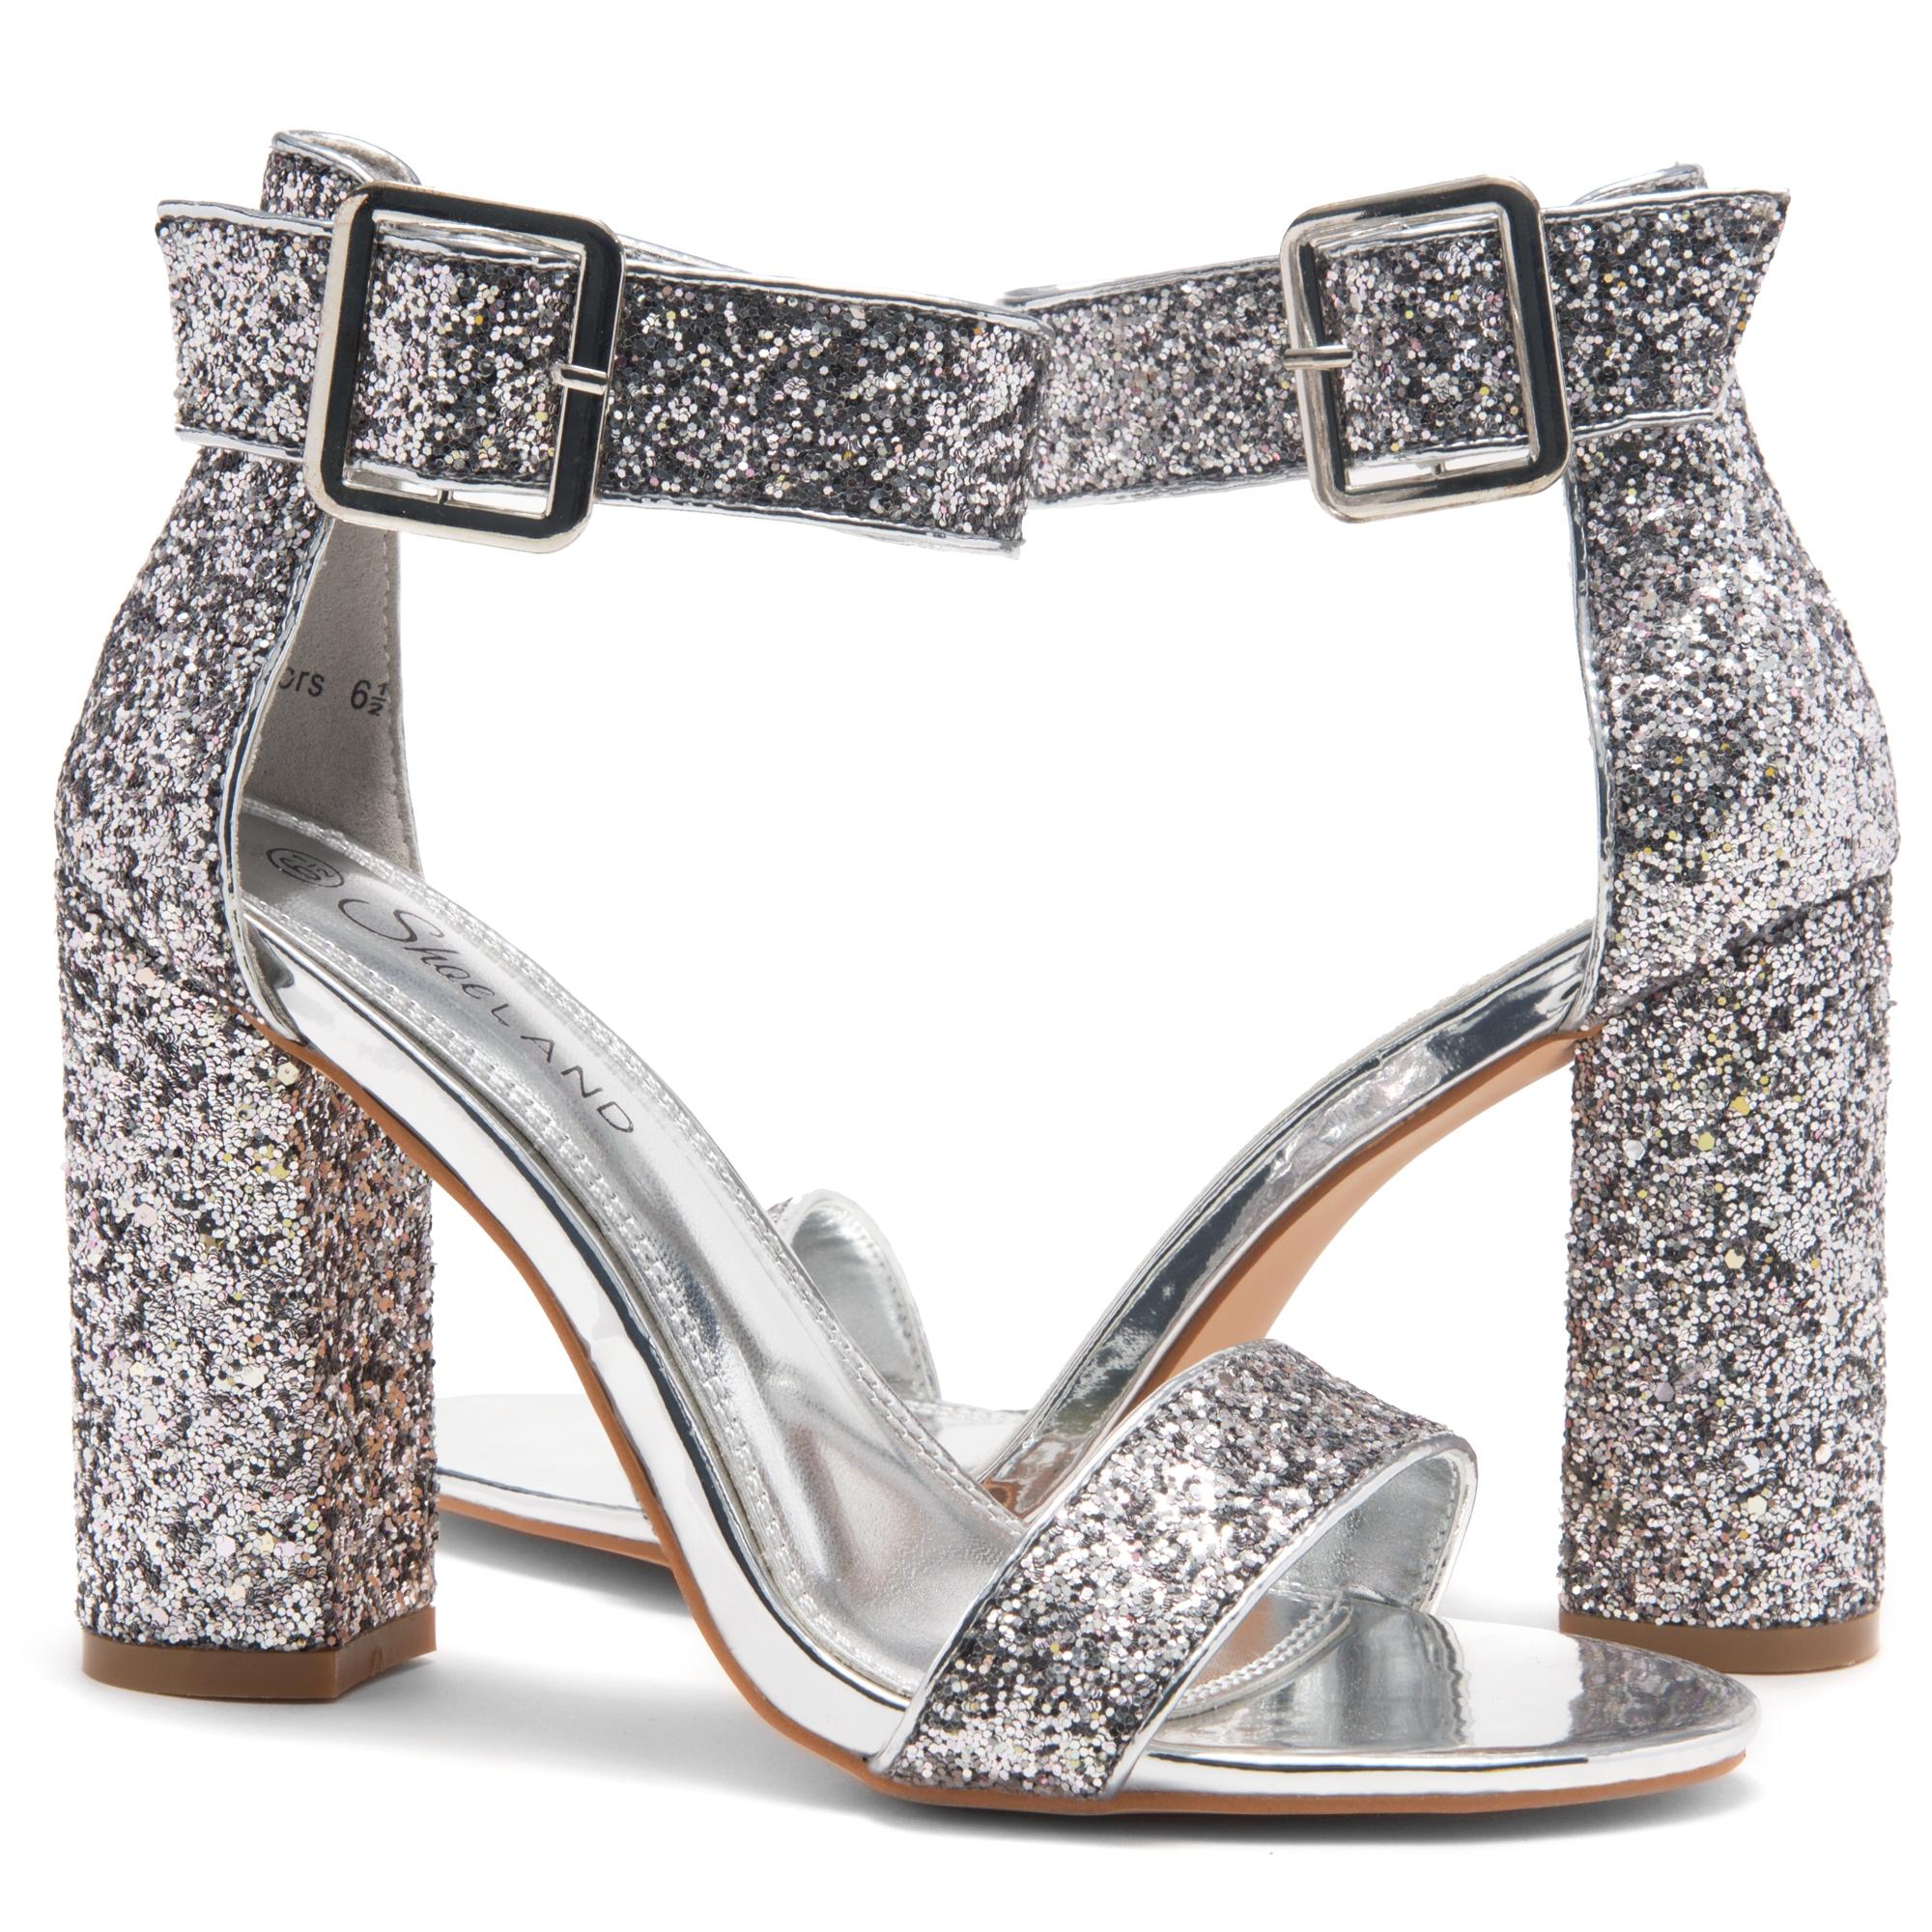 360834befe184 HerStyle Rumors-Glitter, Chunky heel, ankle strap (Silver Glitter)